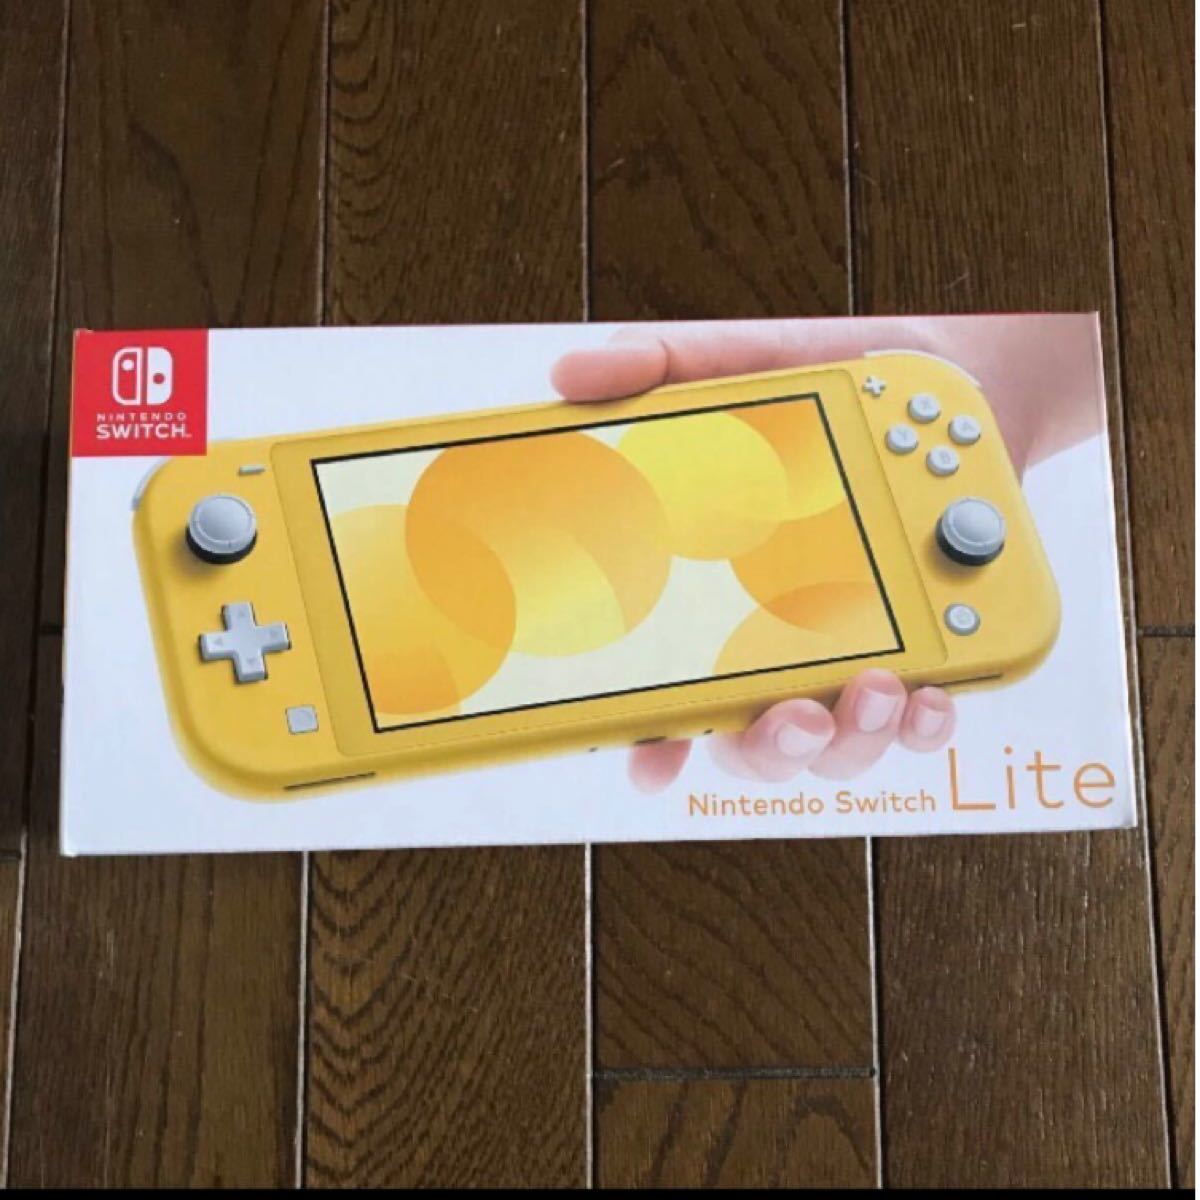 Nintendo Switch Lite 任天堂スイッチライト イエロー 本体